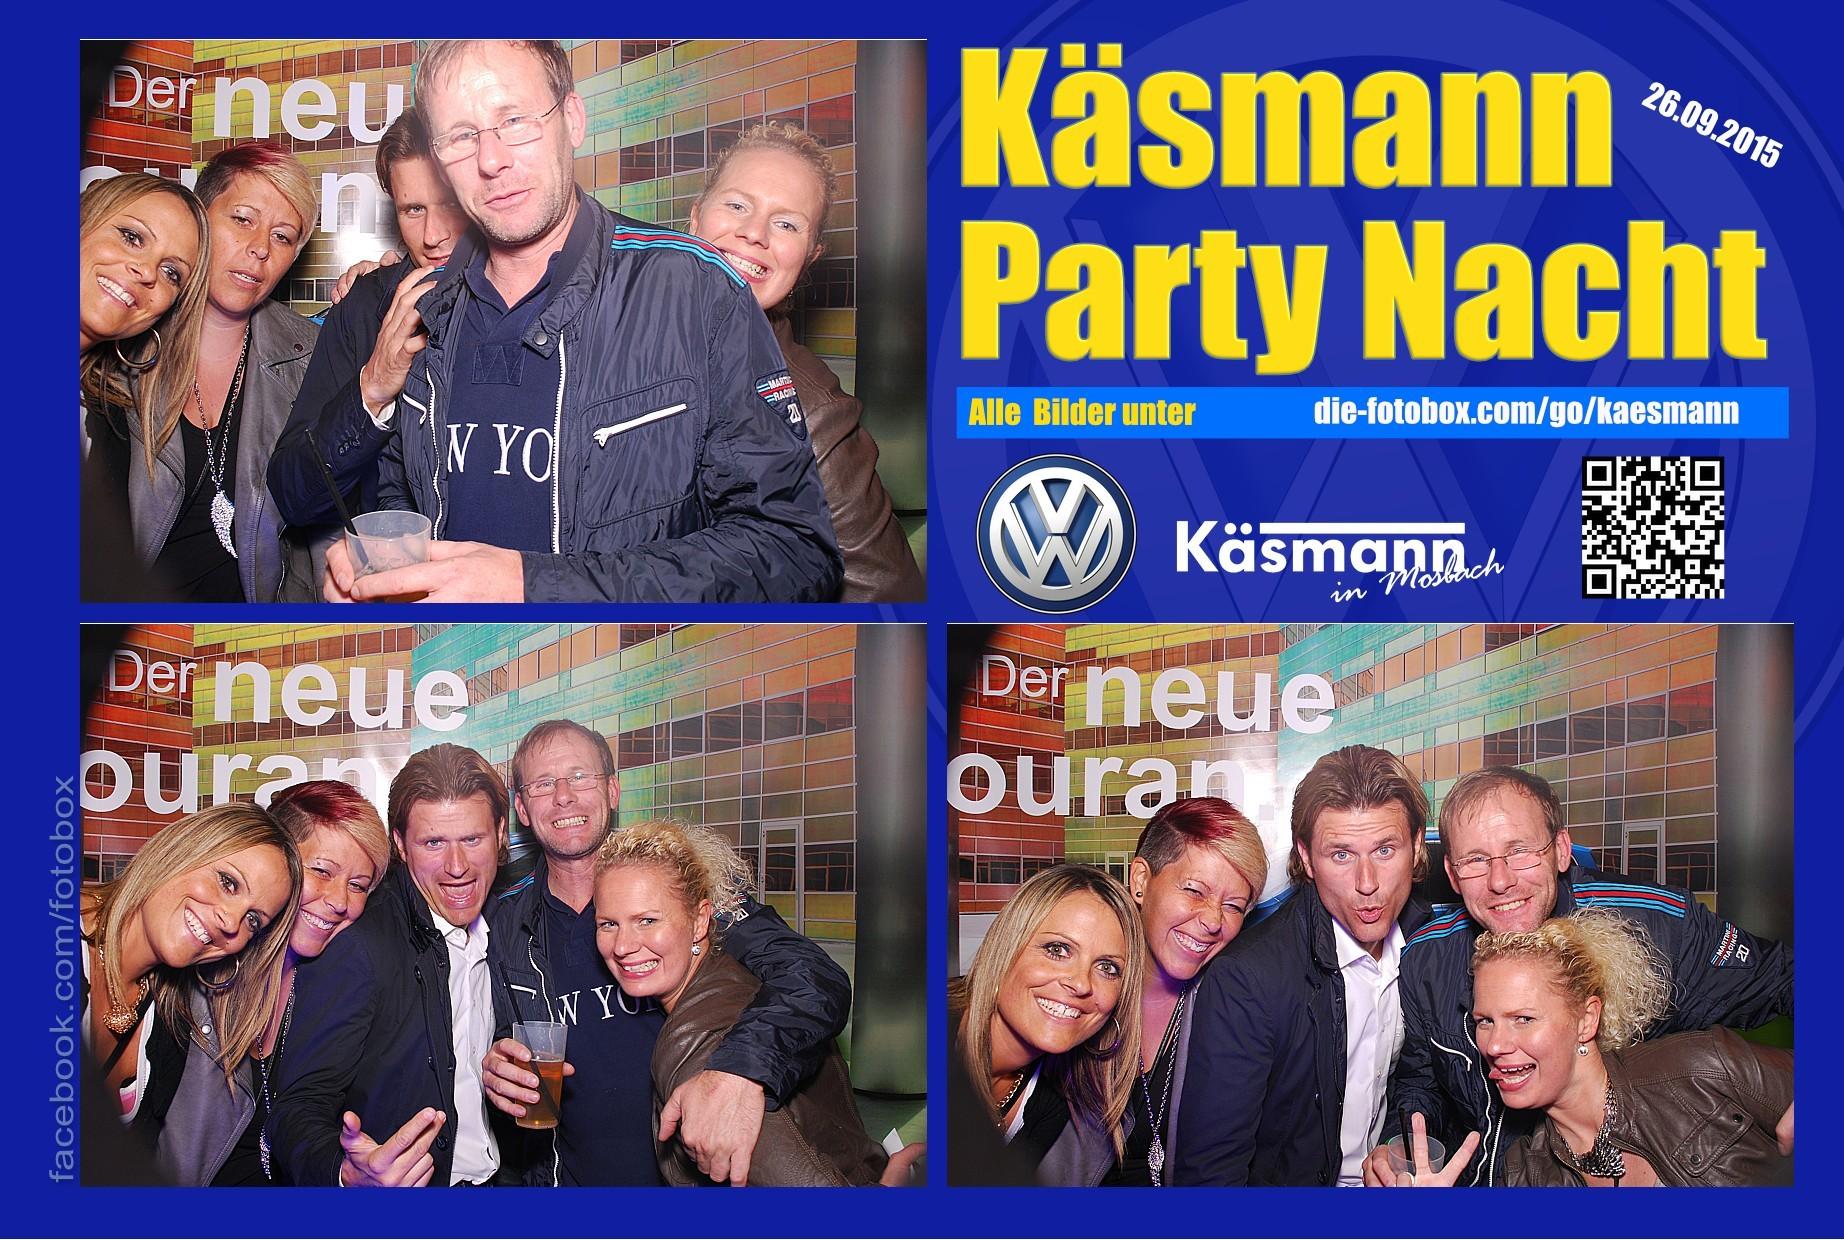 Käsmannparty 2015 - www.die-fotobox.com 01180